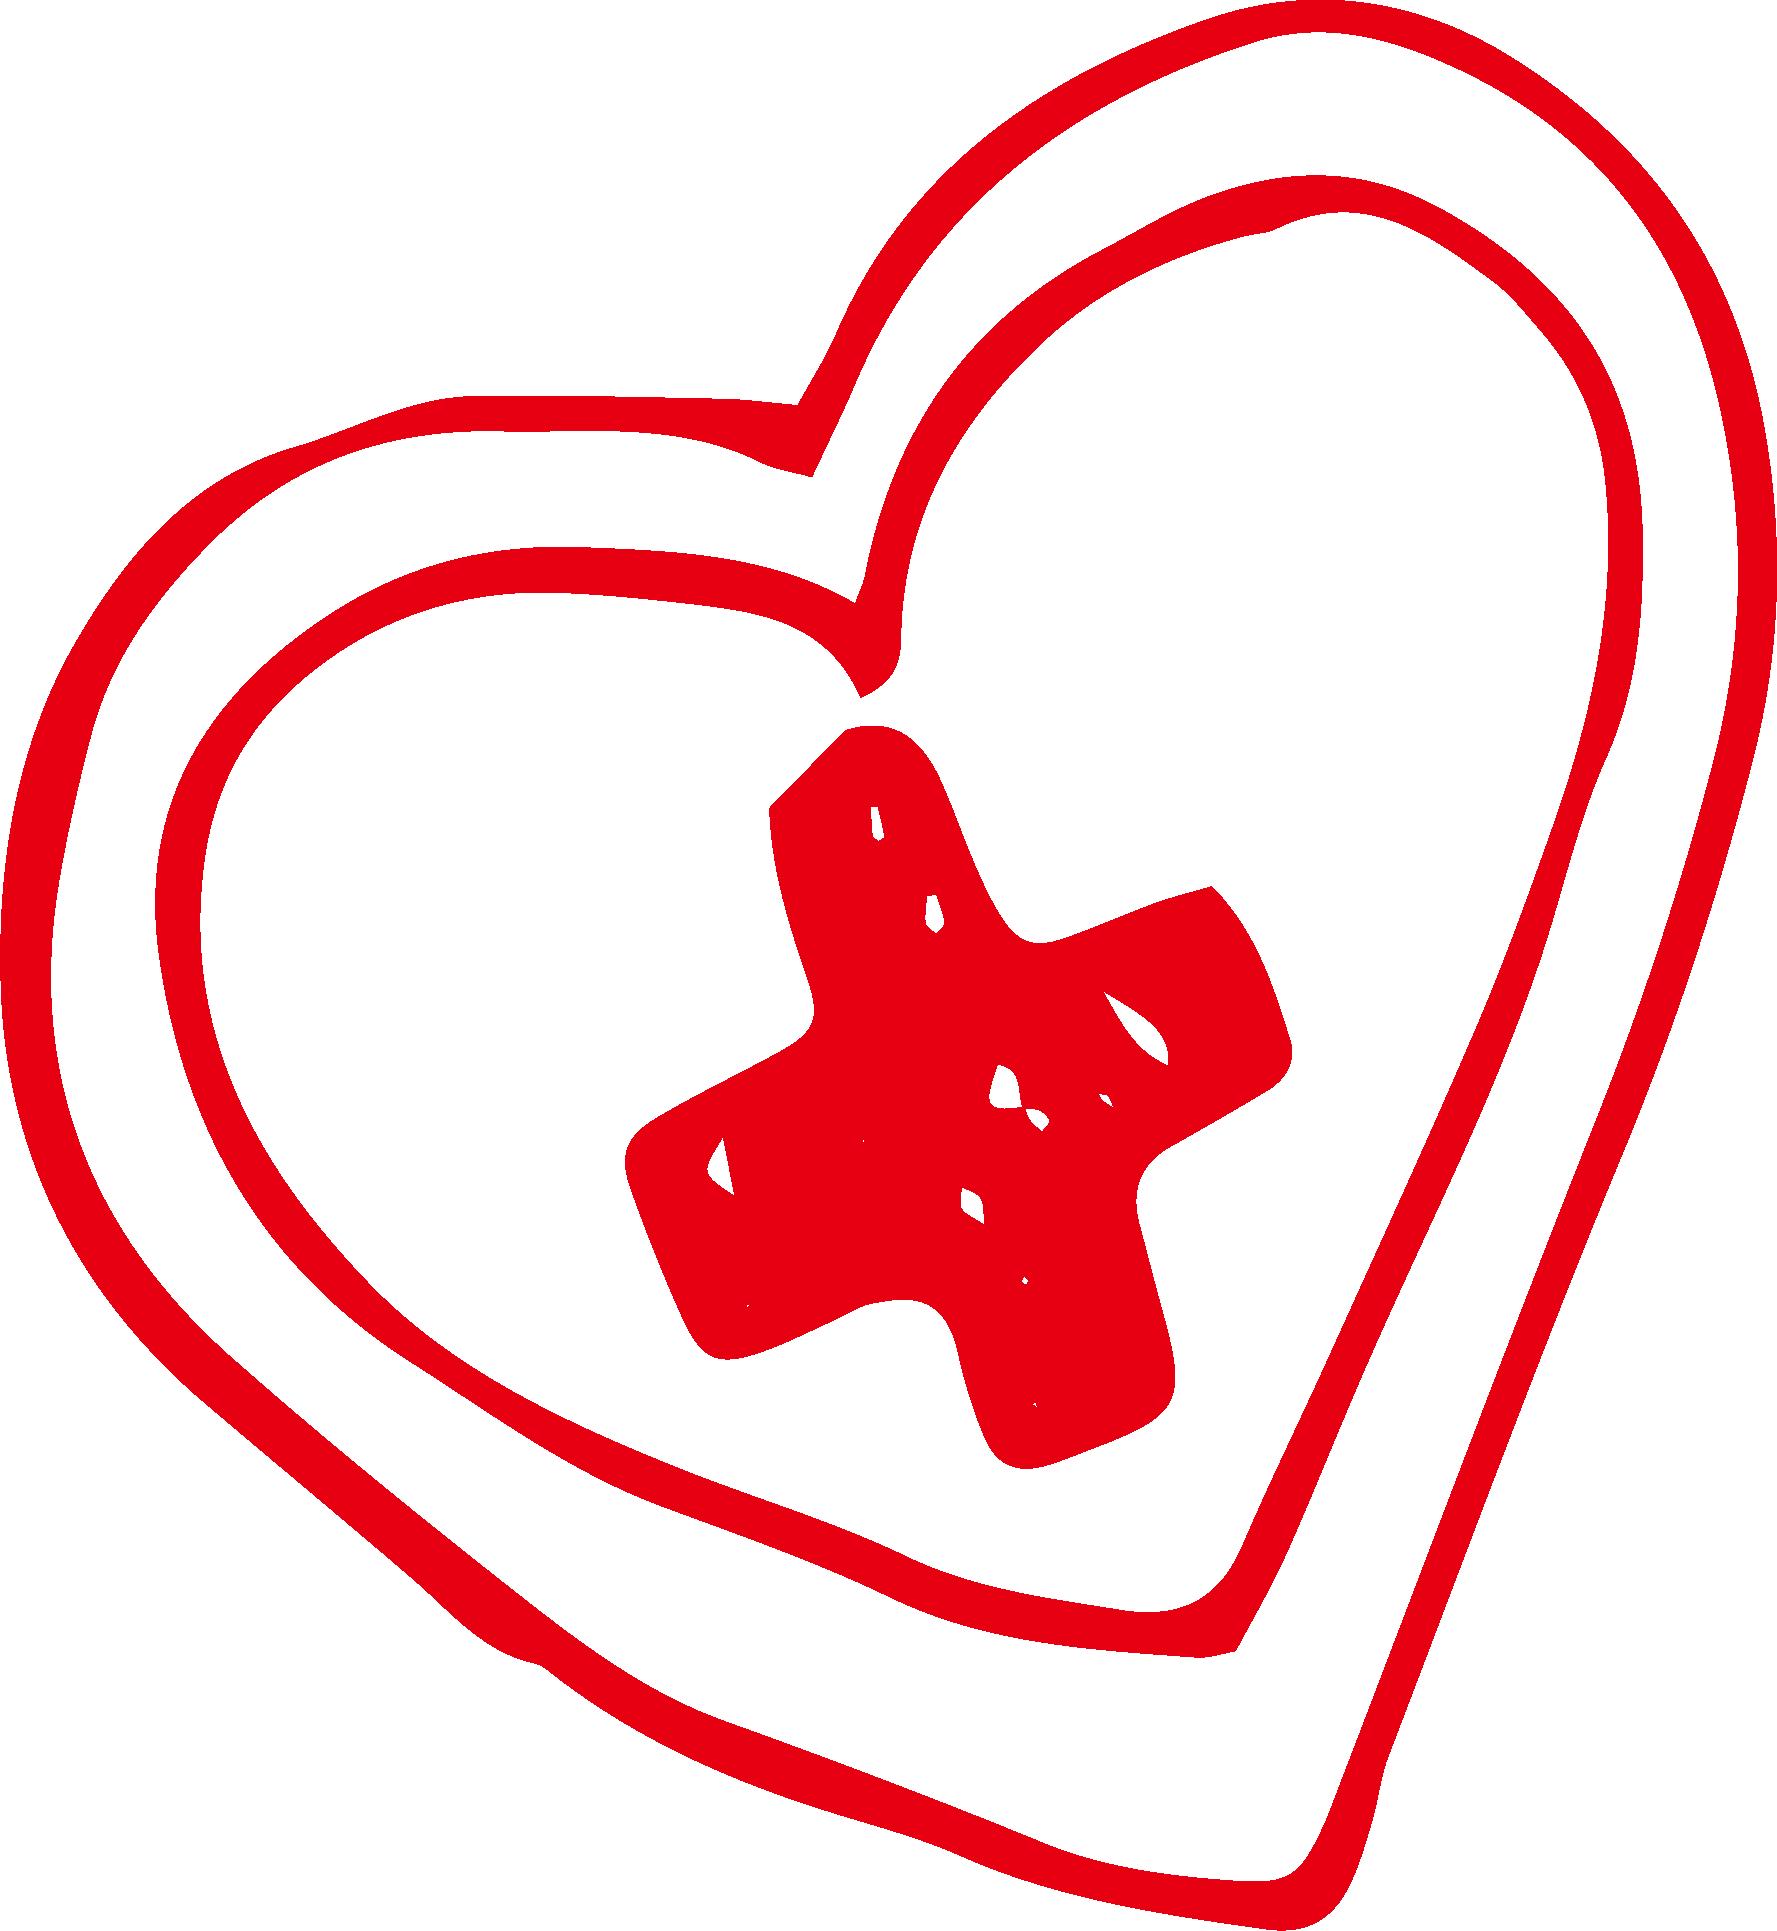 Heartbeat clipart bradycardia. Heart rate clip art